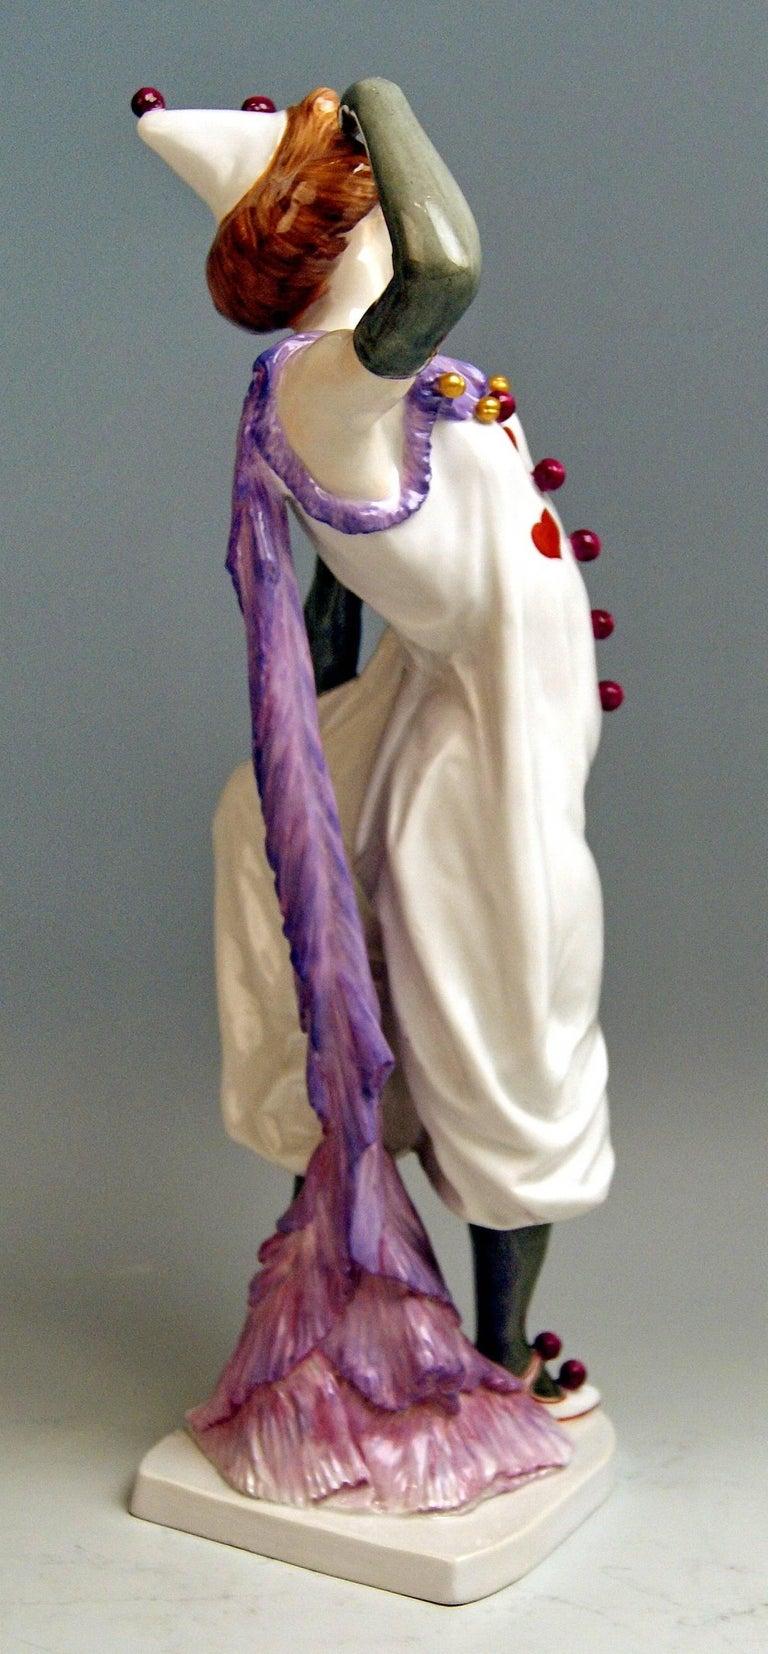 German Meissen Pierrette Model Y 165 Wiegand Martin Tall Figurine Made, 1909-1915 For Sale